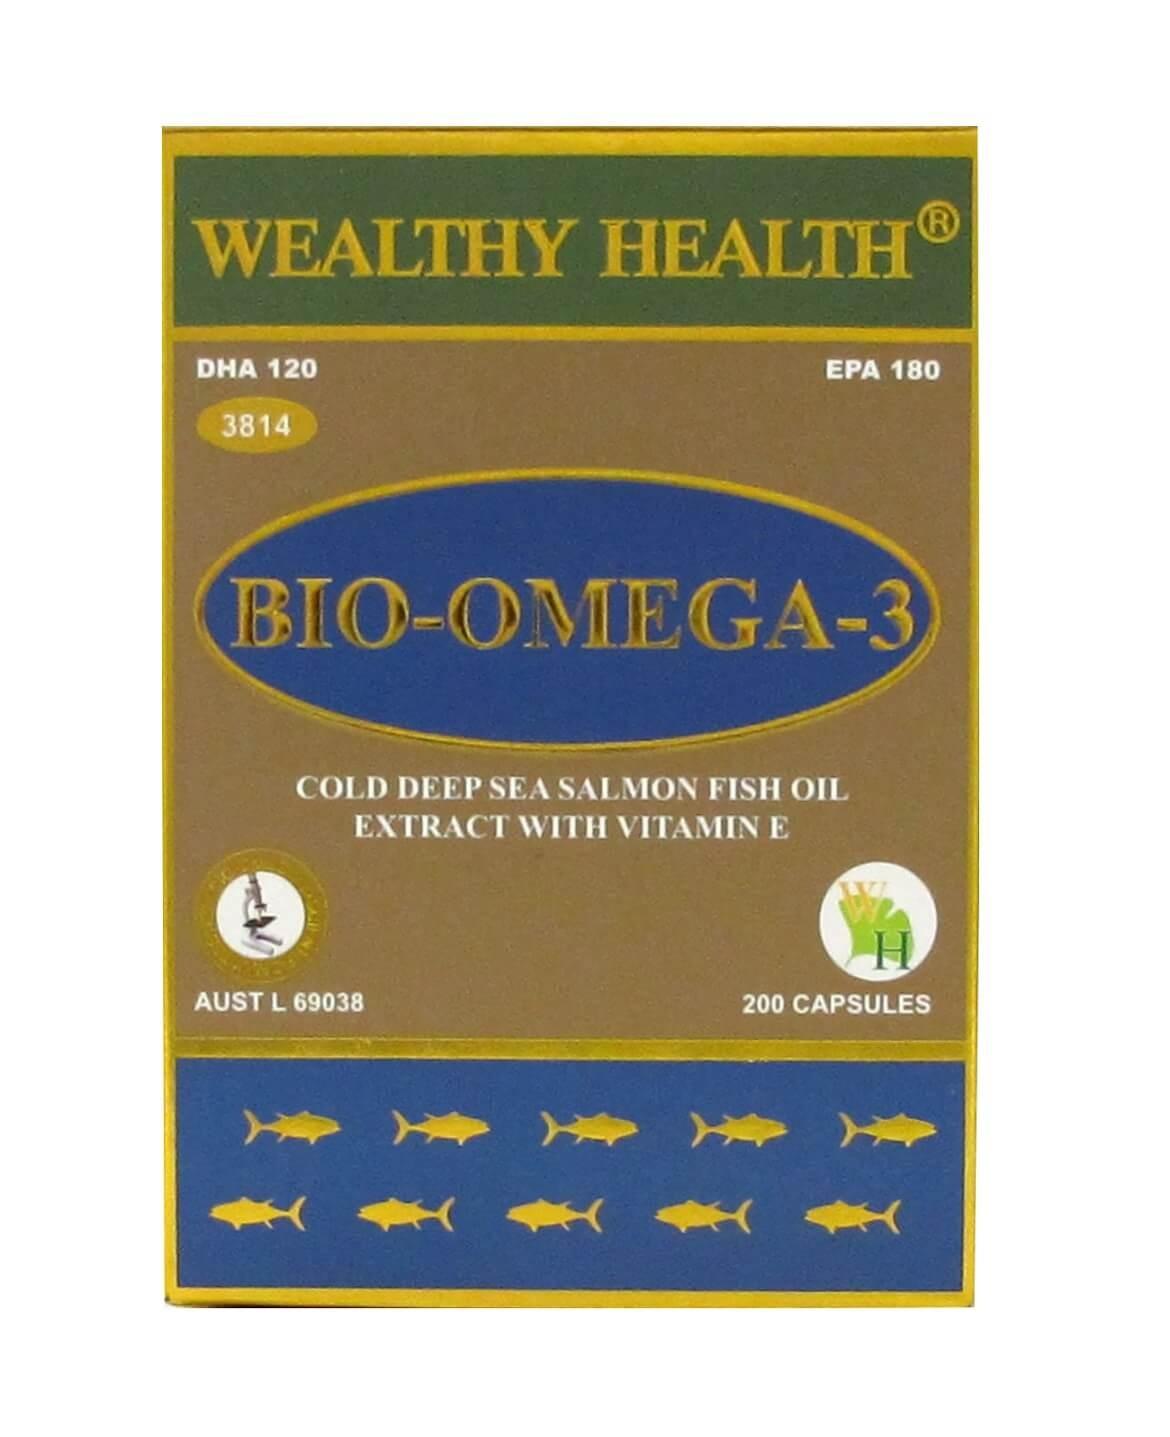 Wealthy Health - Bio Omega 3 200 Capsules